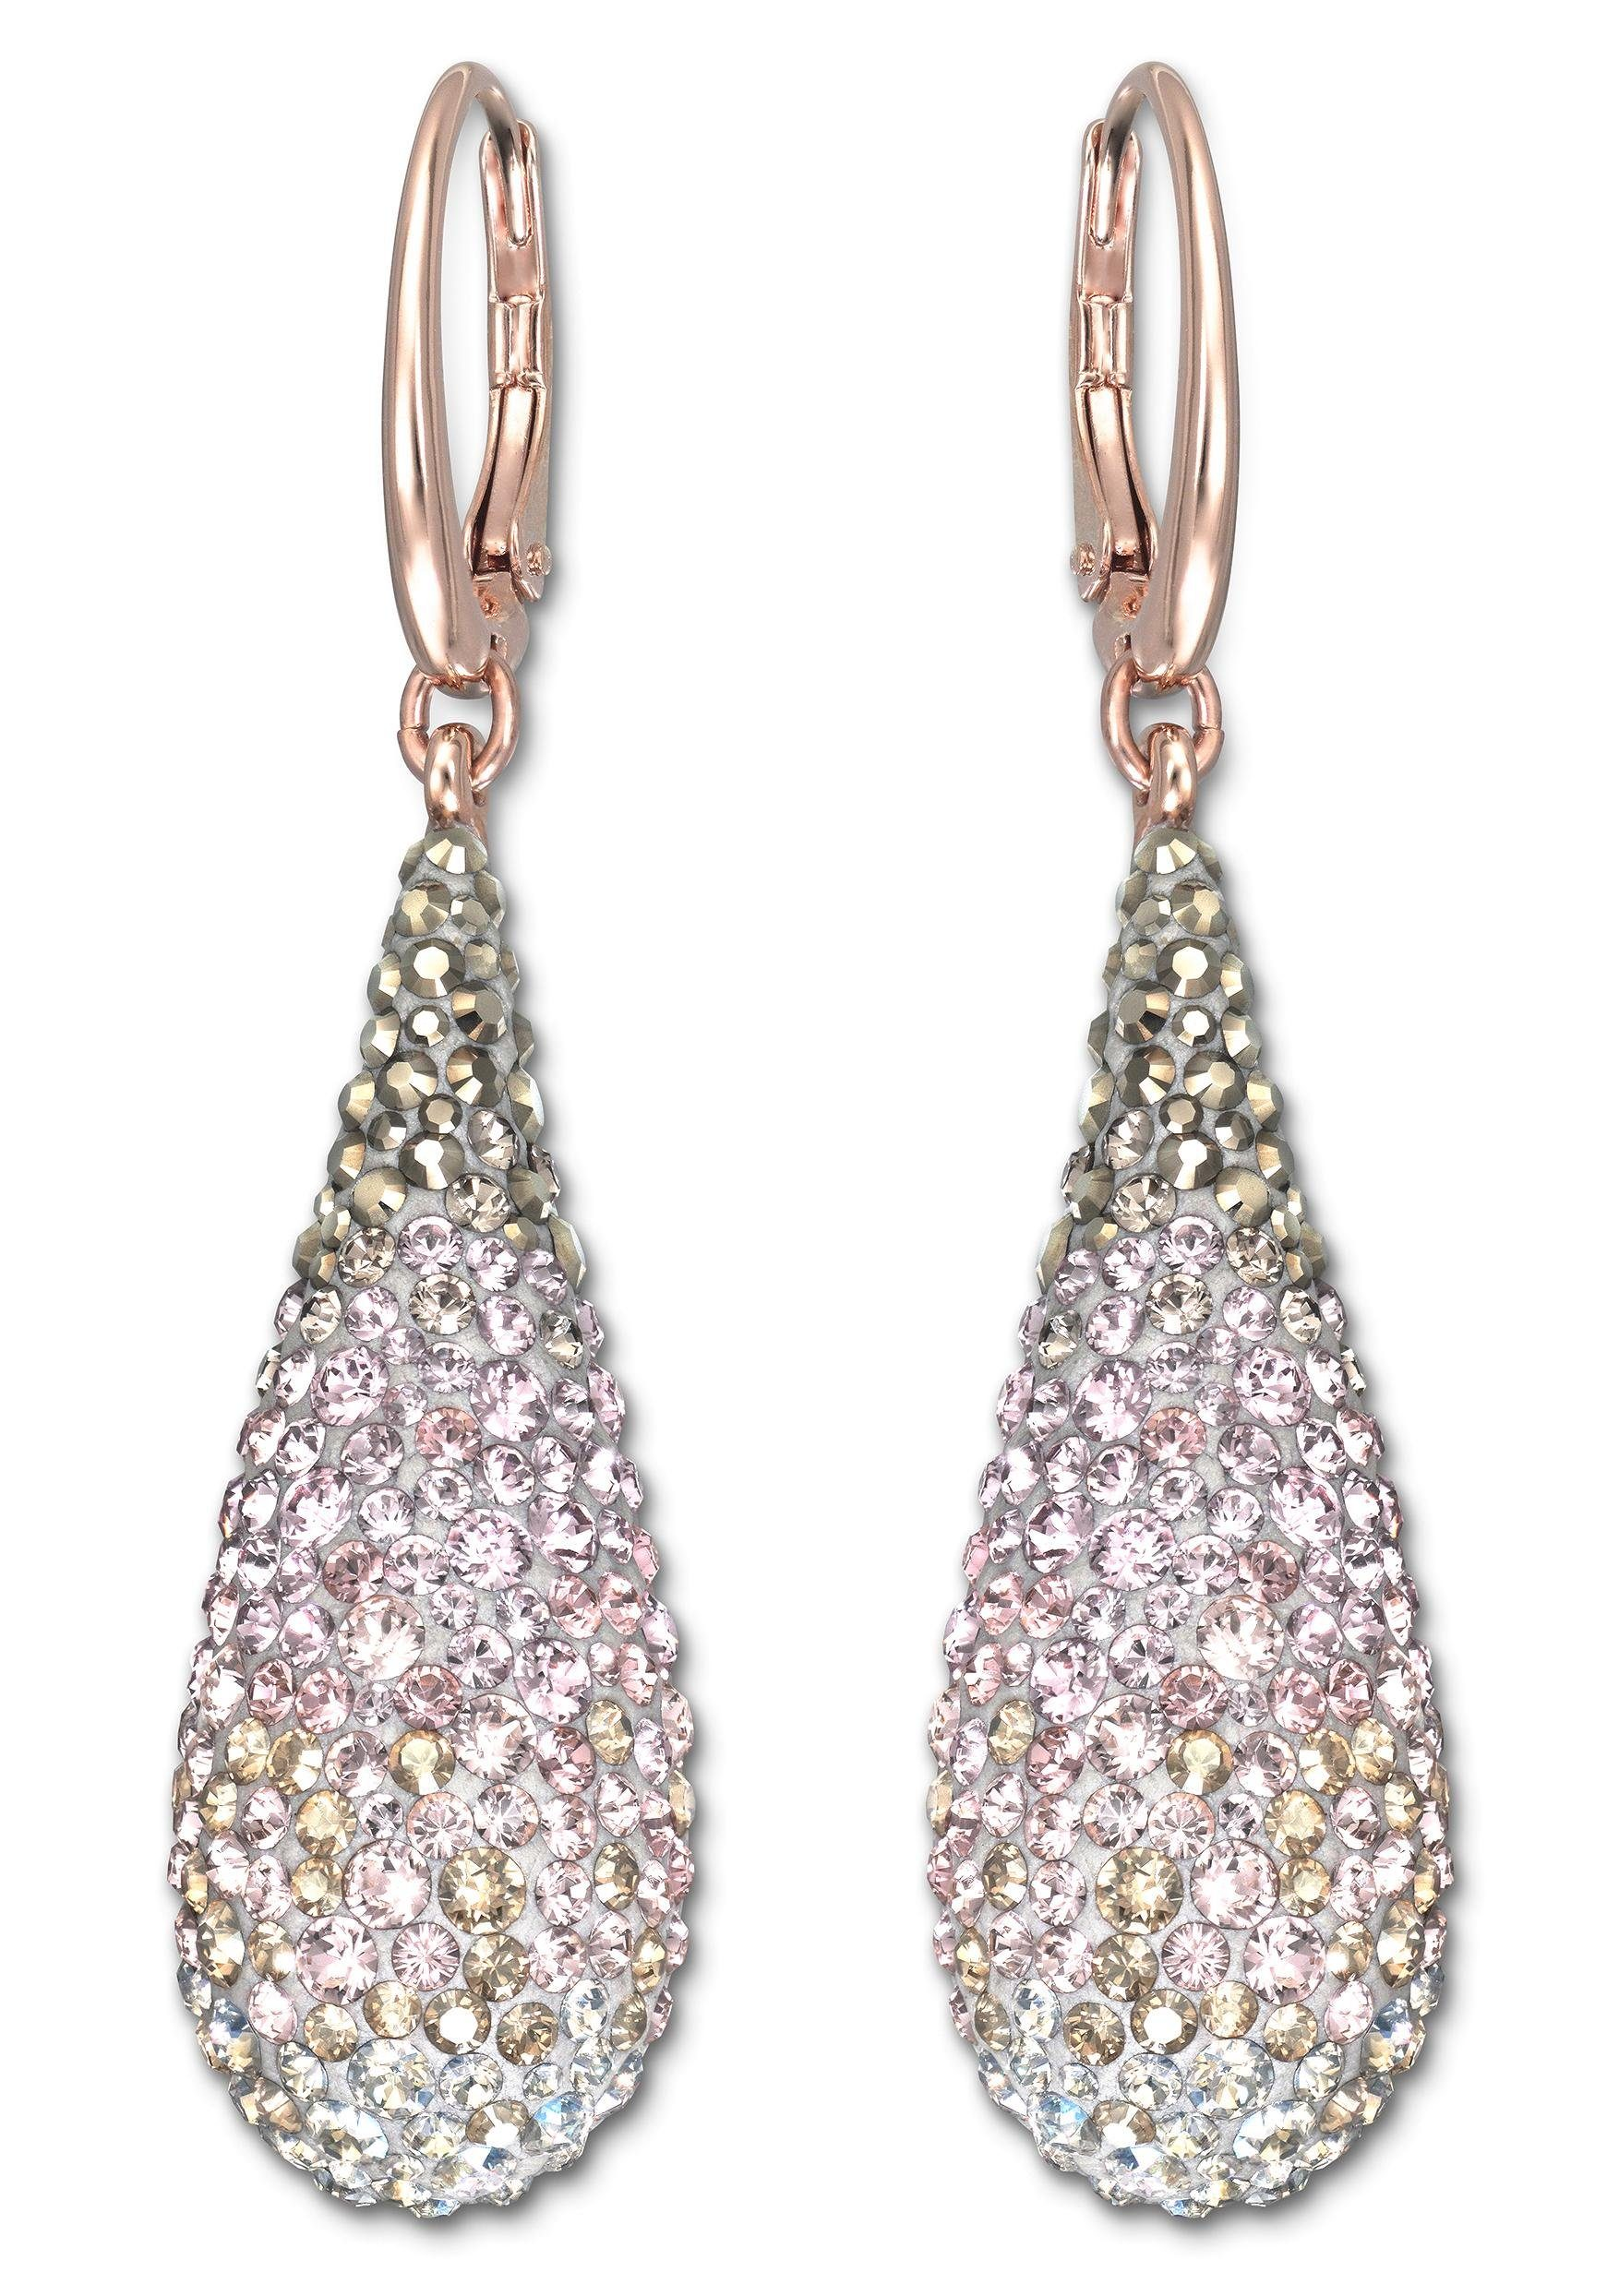 Swarovski Paar Ohrhänger »Abstract, mehrfarbig, rosé Vergoldung, 5046998« mit Swarovski® Kristallen